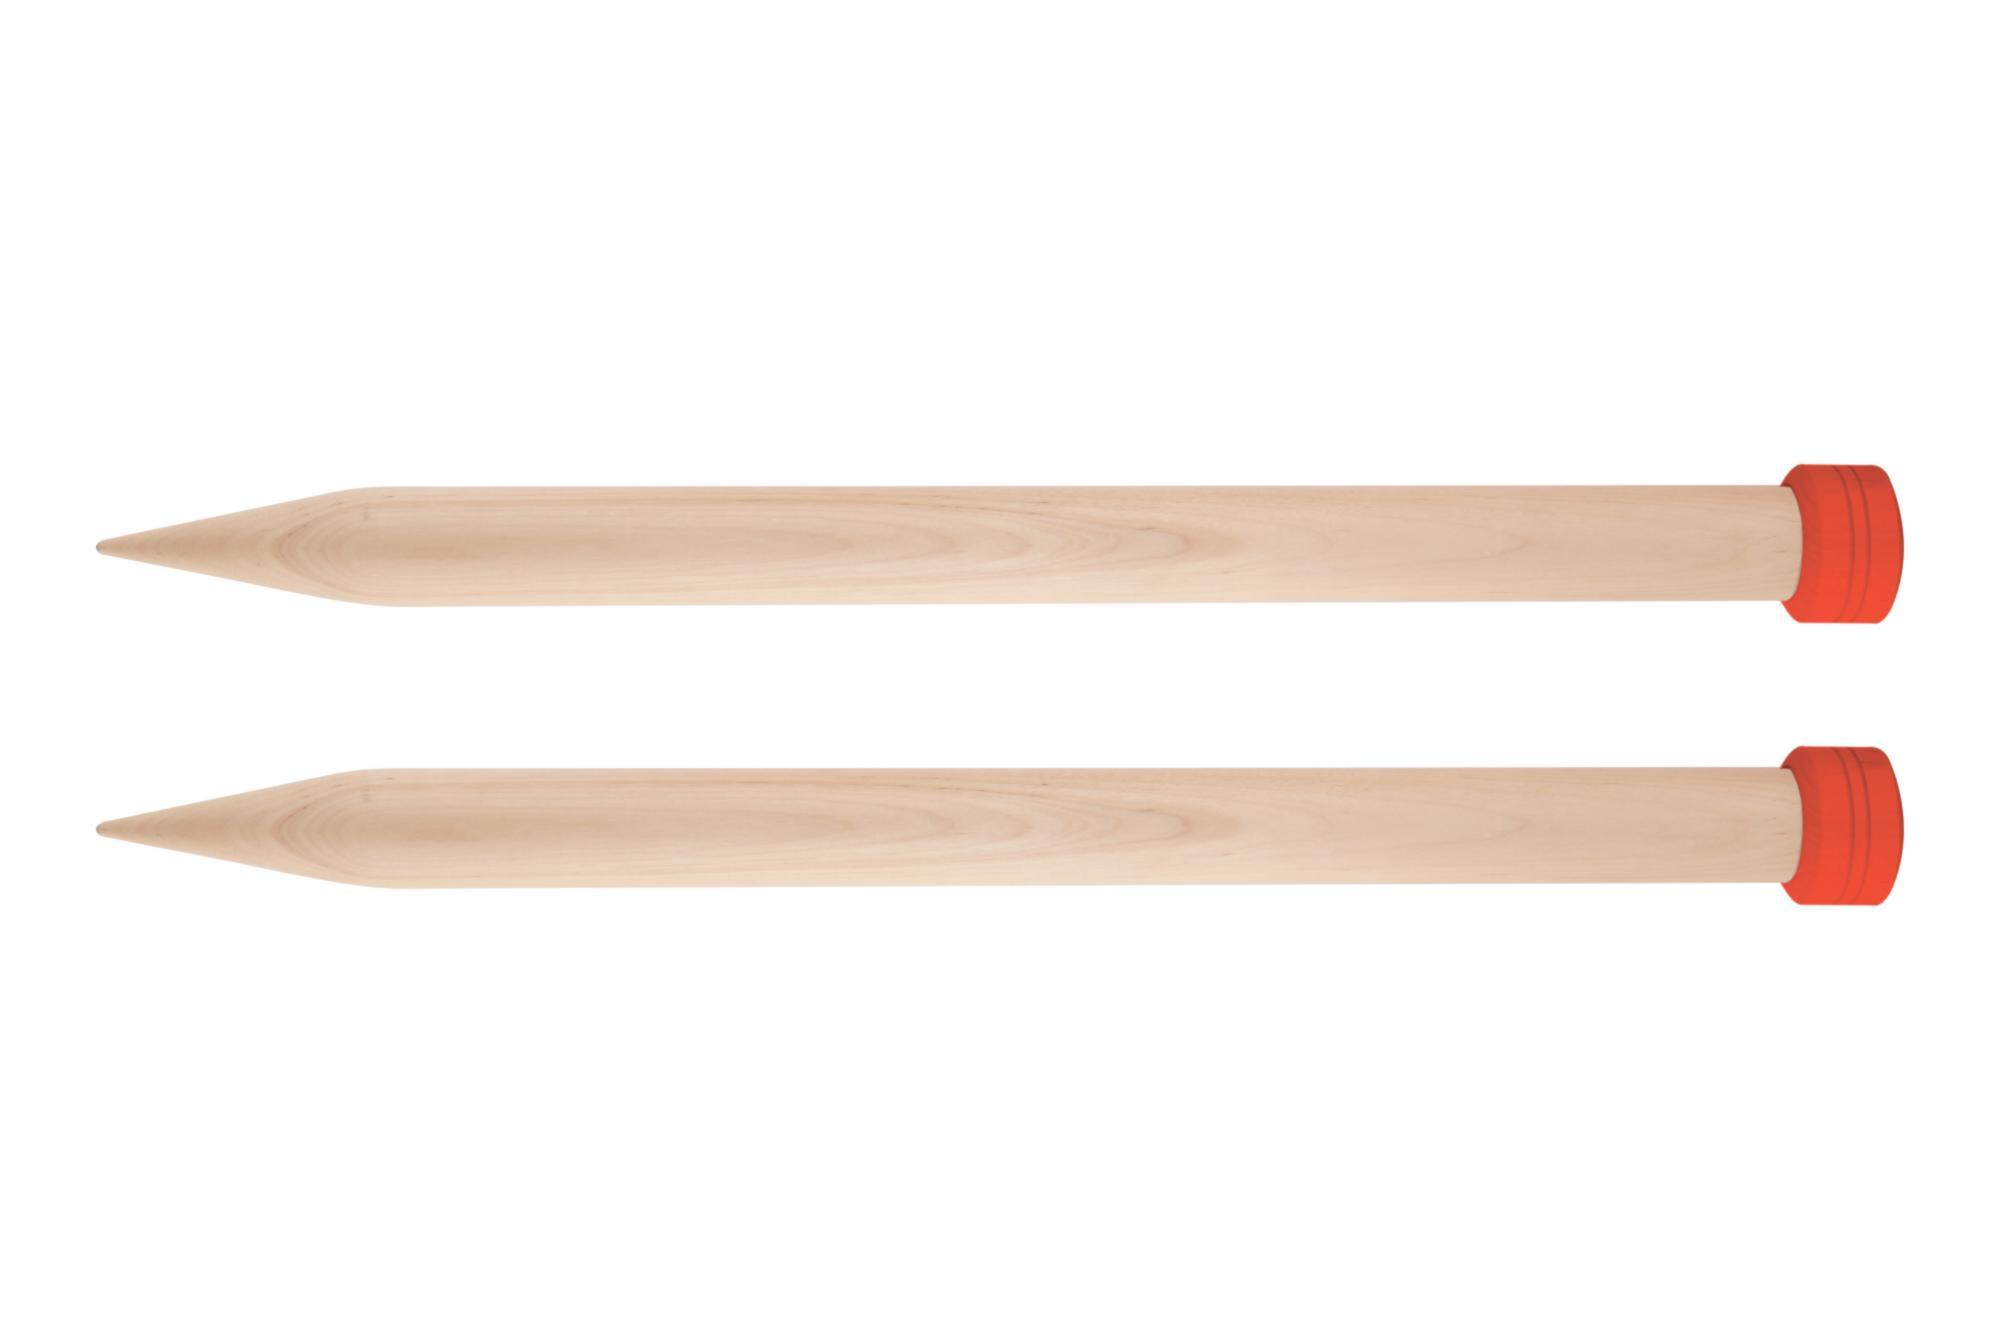 Спицы прямые 40 см Jumbo Birch KnitPro, 35291, 25.00 мм